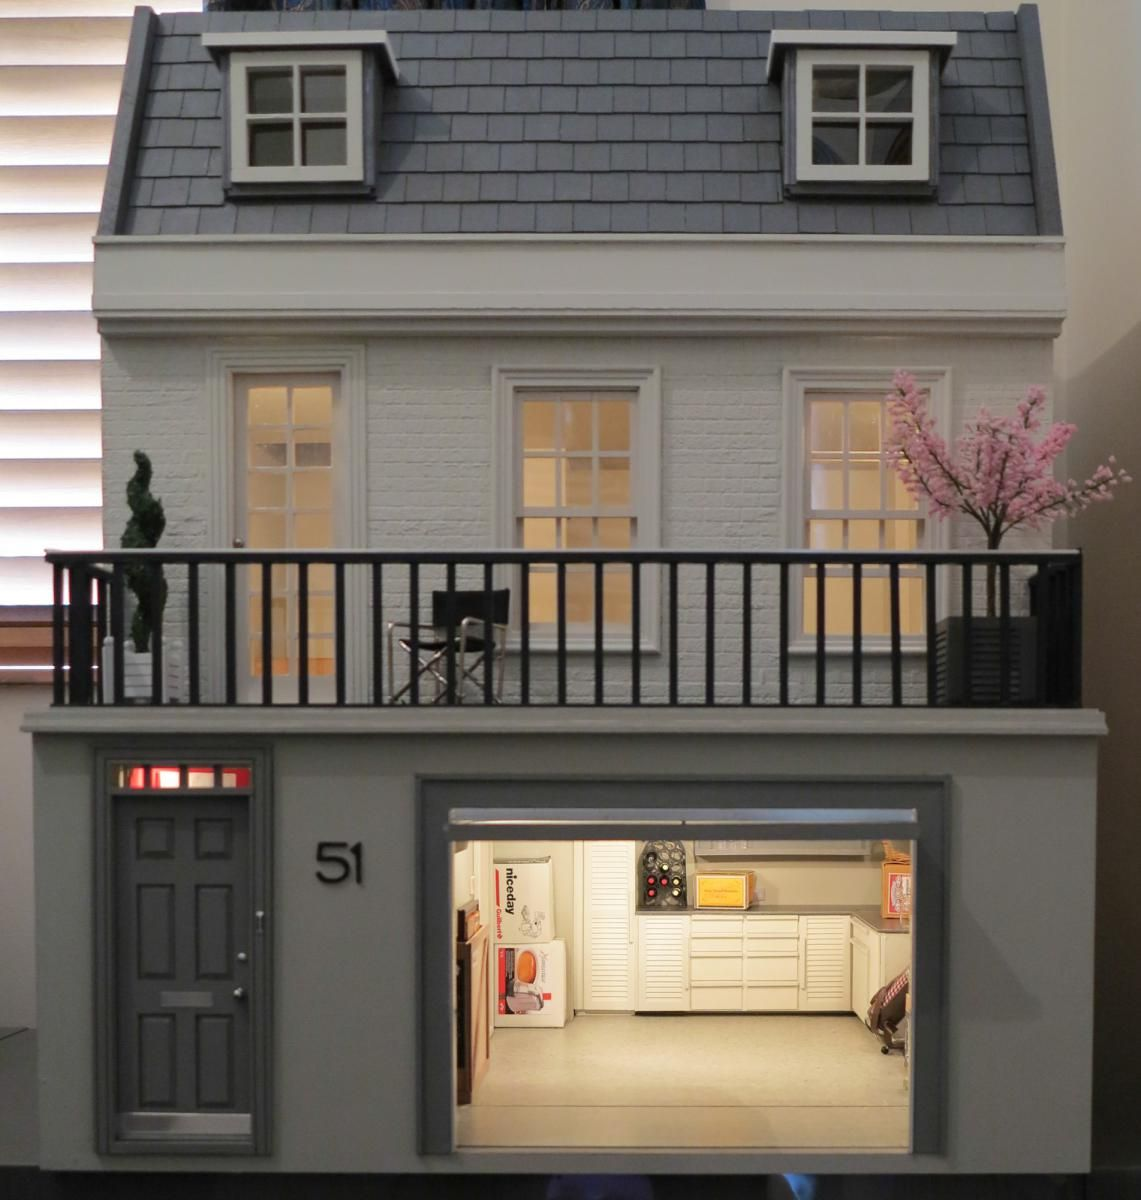 Pin By Lorna Macdougall On Garage Plans: Diminutive Dwellings Two